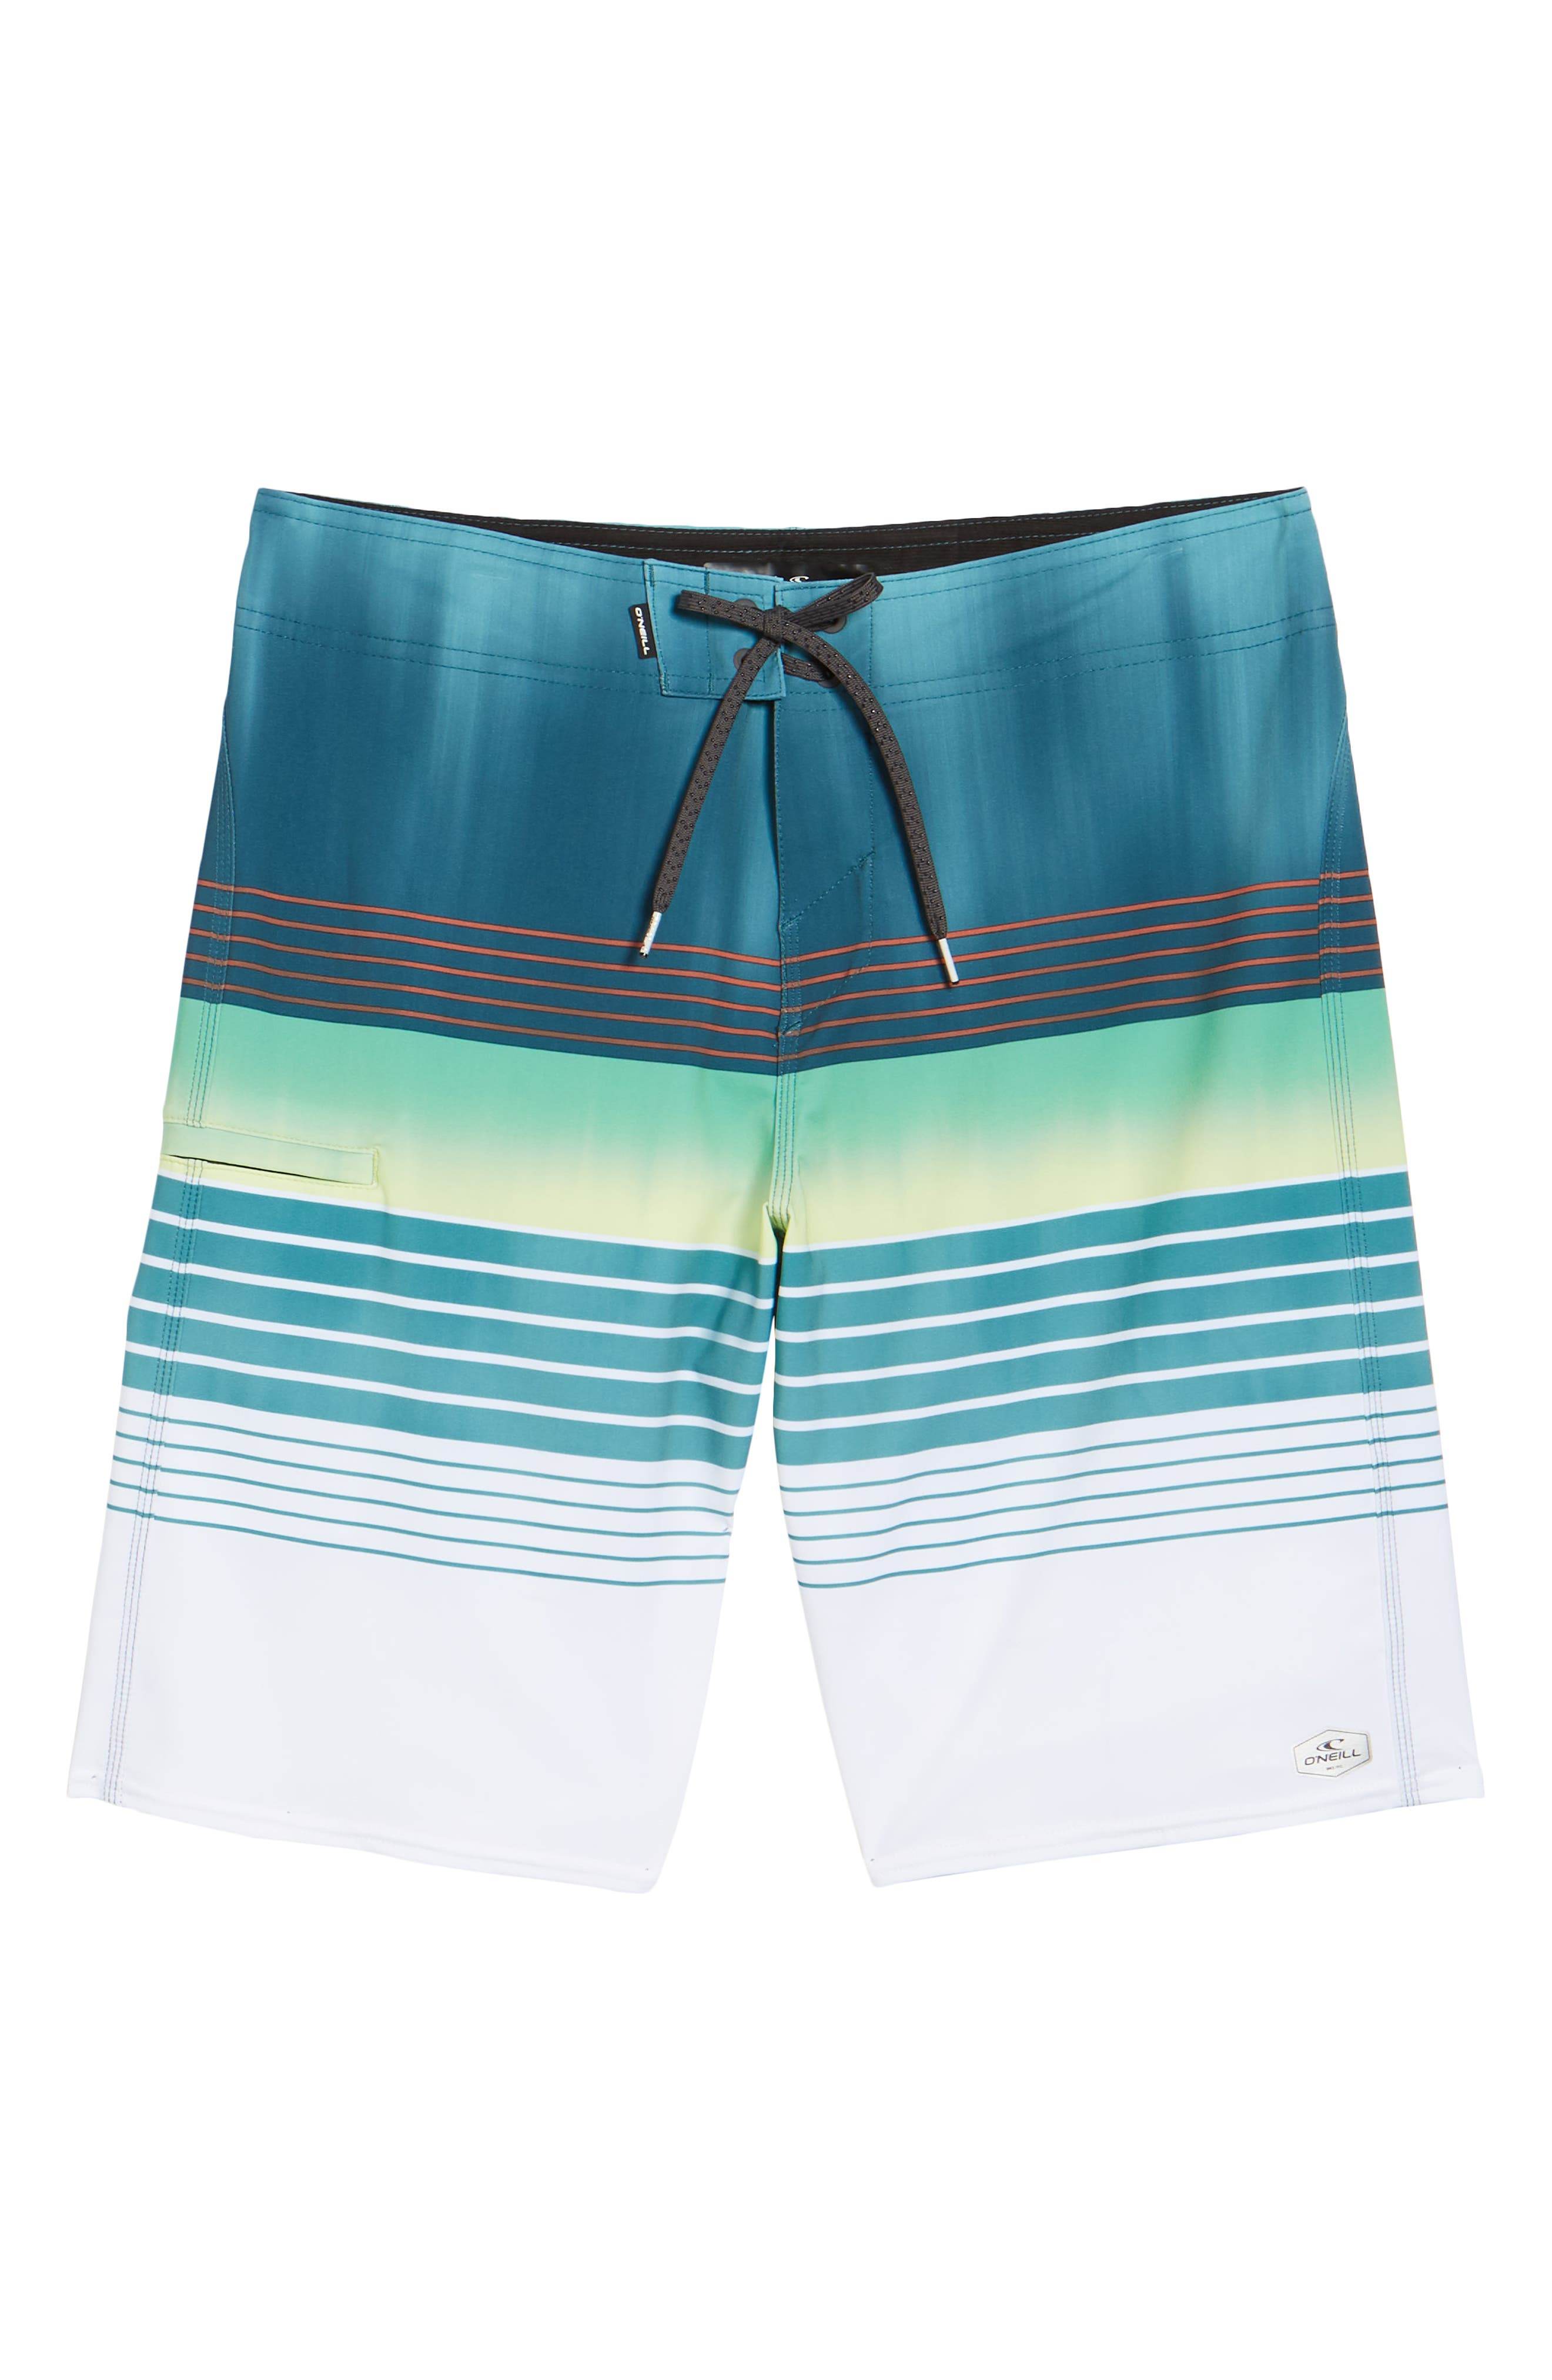 Hyperfreak Heist Board Shorts,                             Alternate thumbnail 6, color,                             DARK BLUE